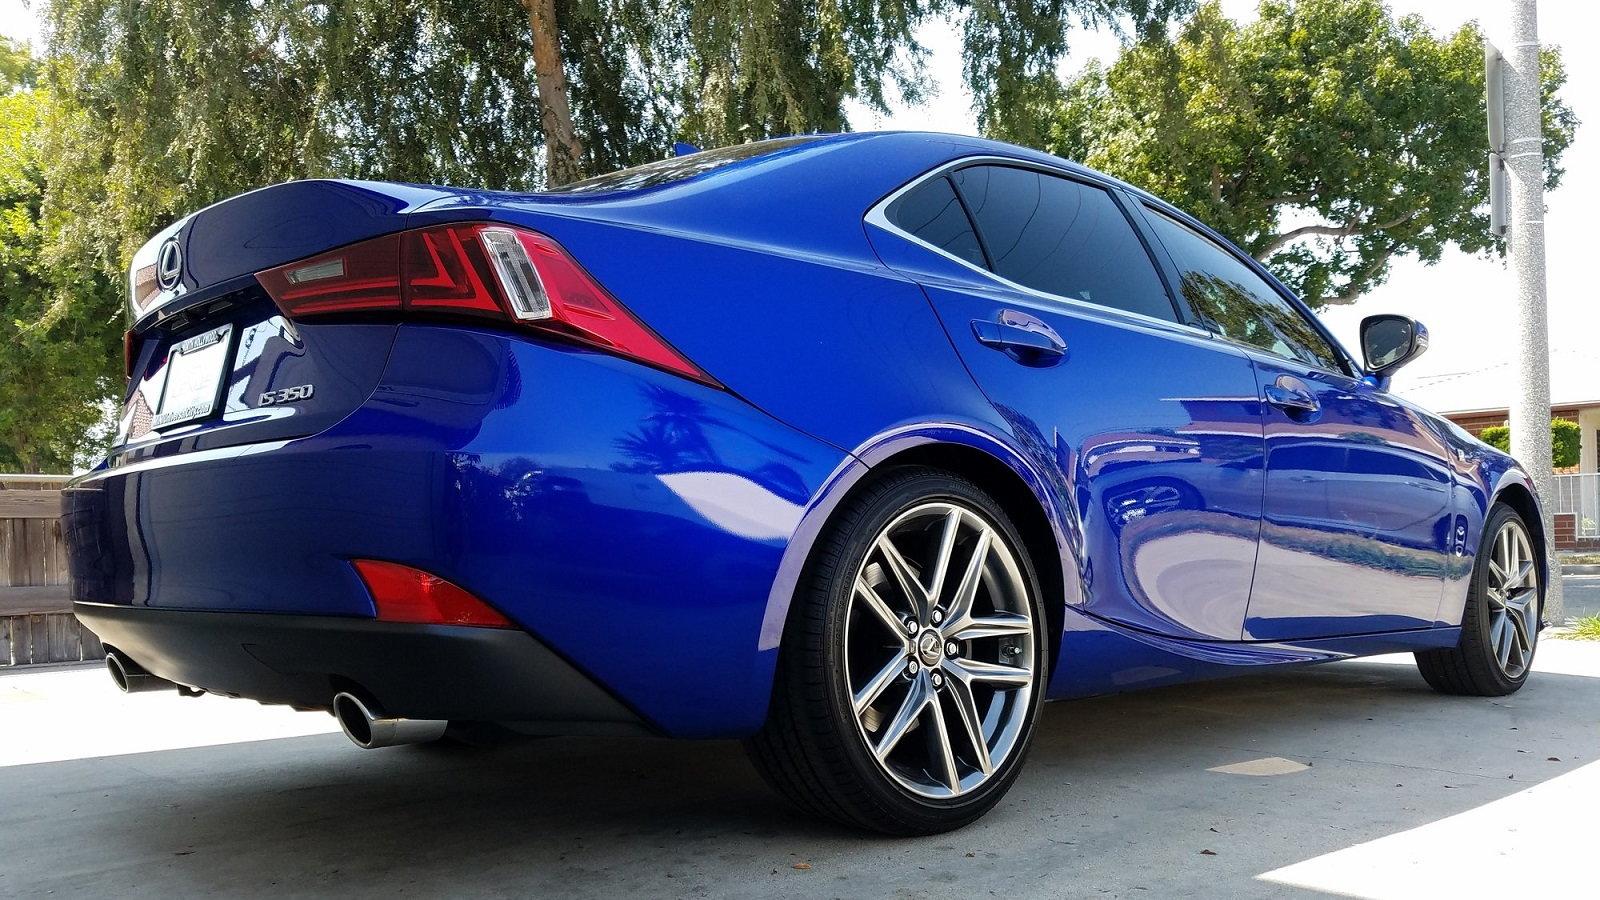 Stunning Bagged Lexus IS Undergoes Shocking Transformation